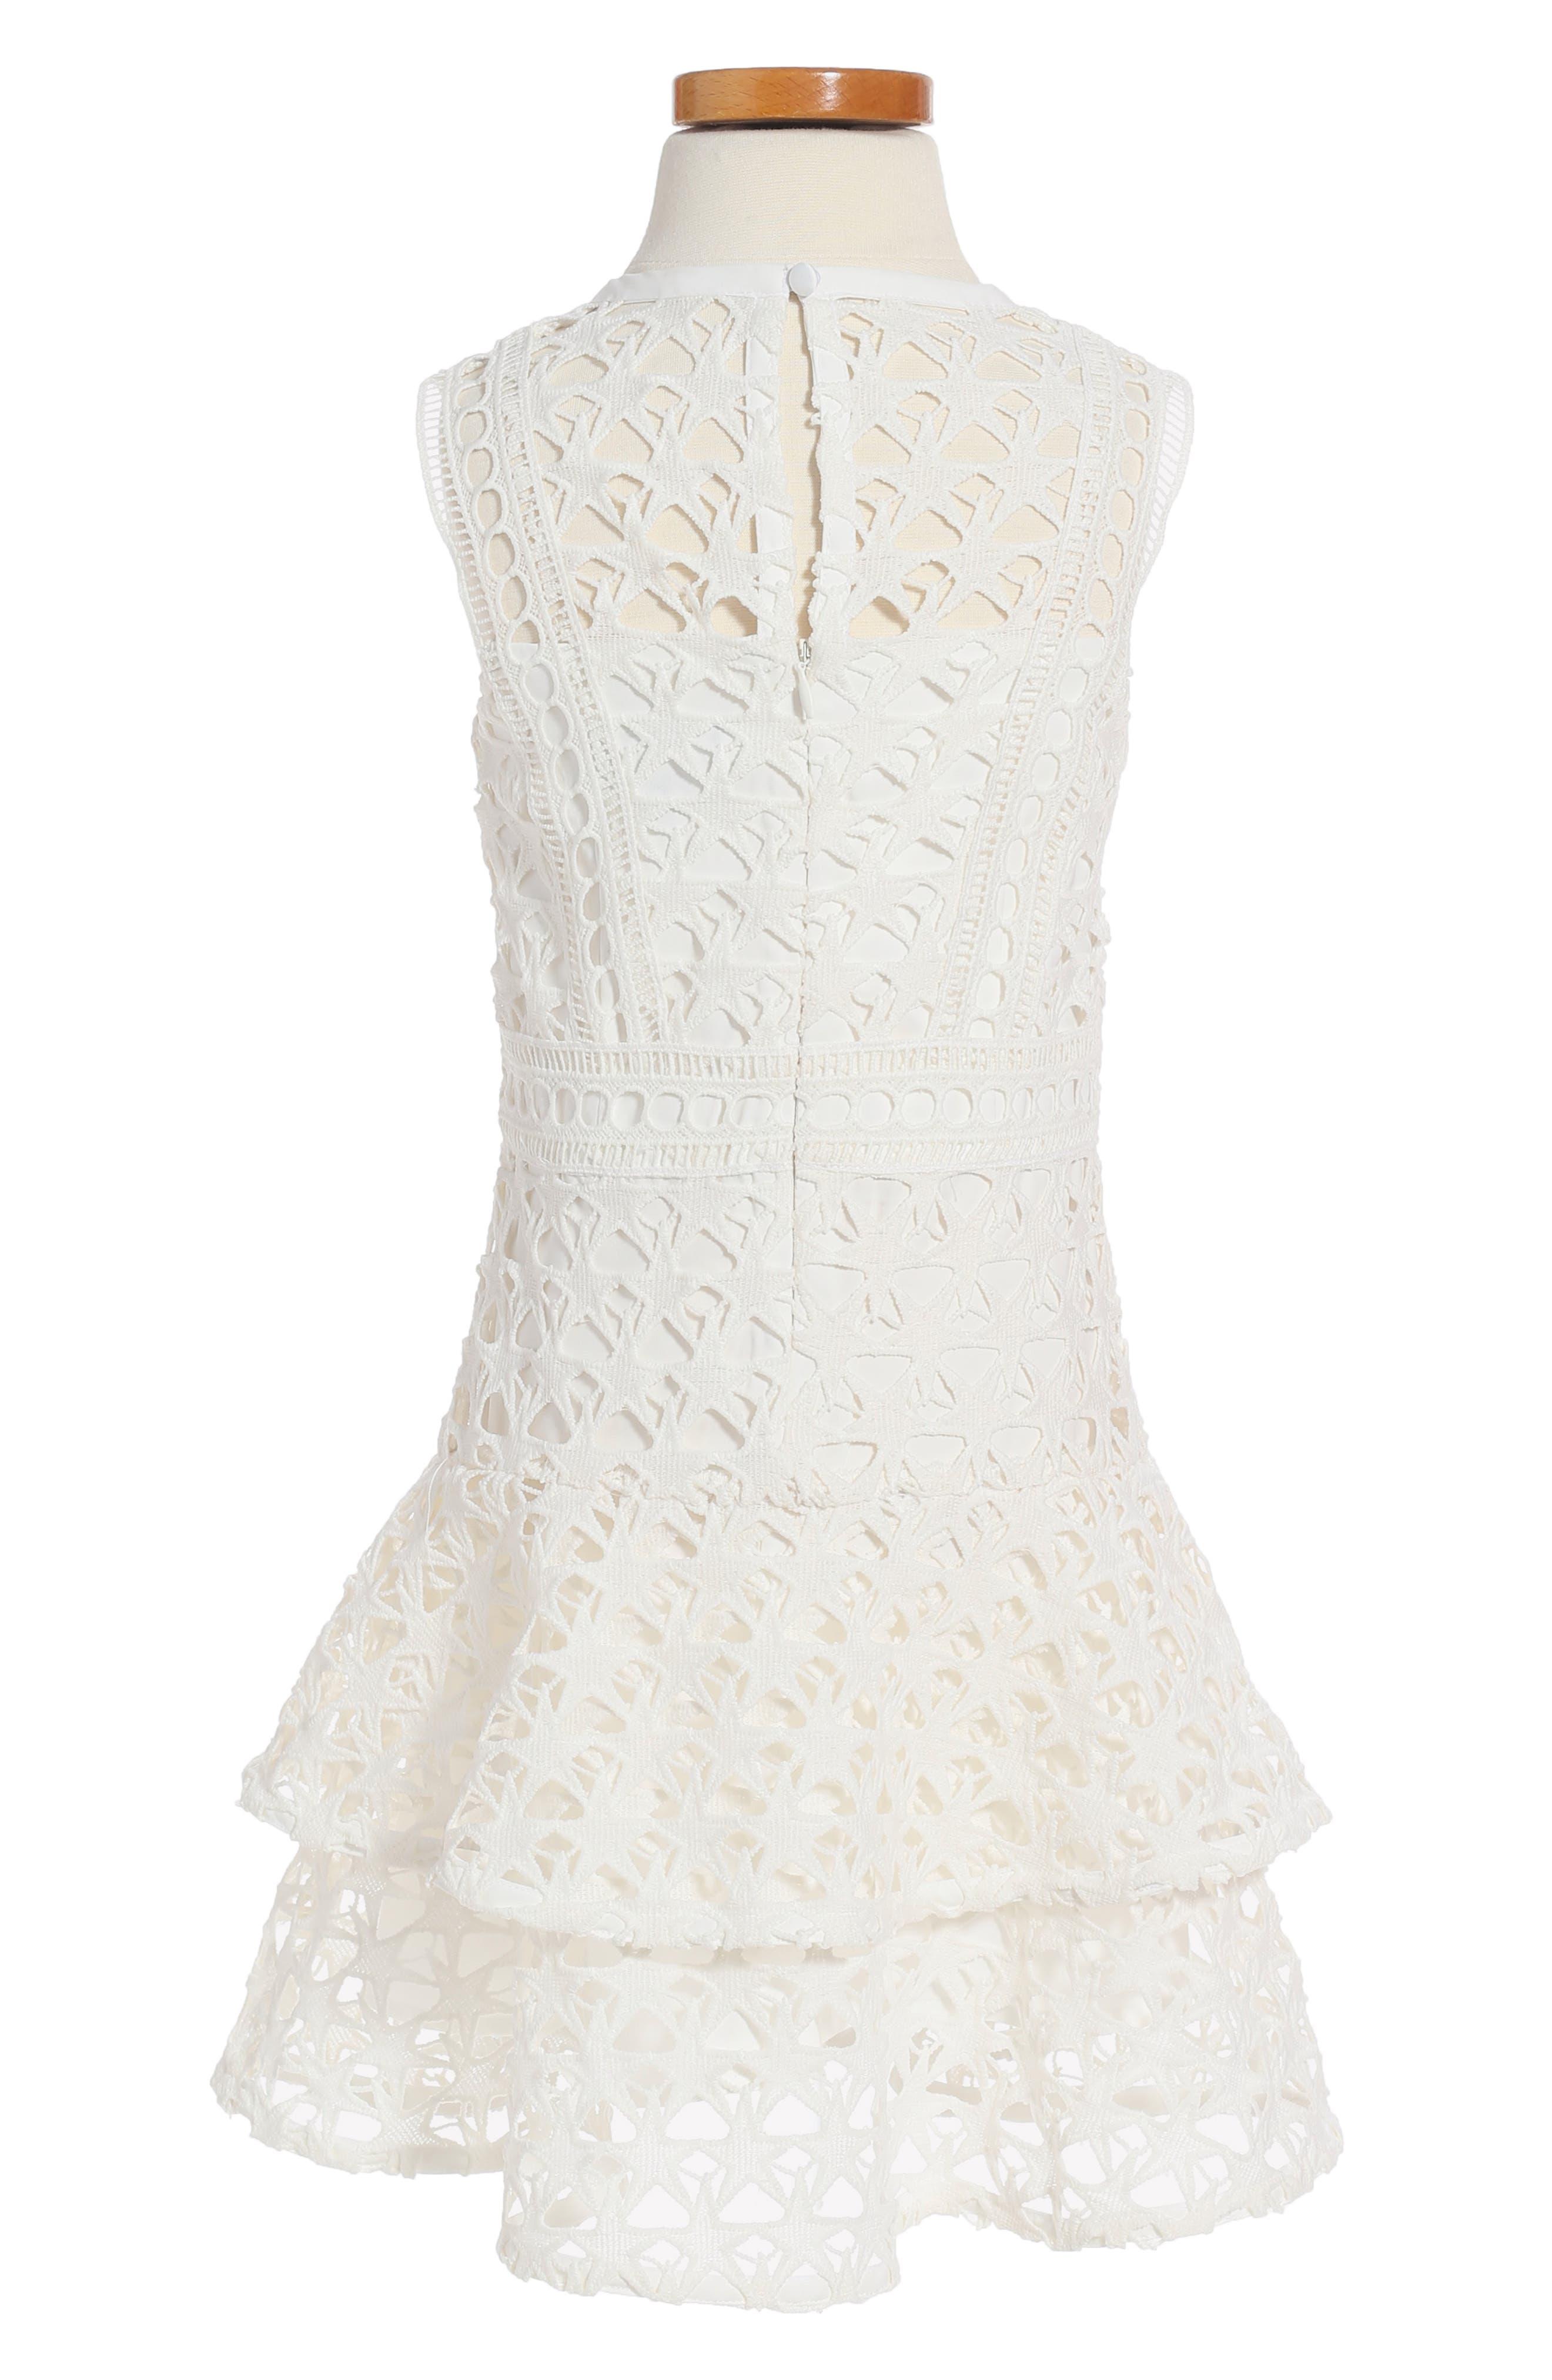 Junior Star Lace Dress,                             Alternate thumbnail 2, color,                             White